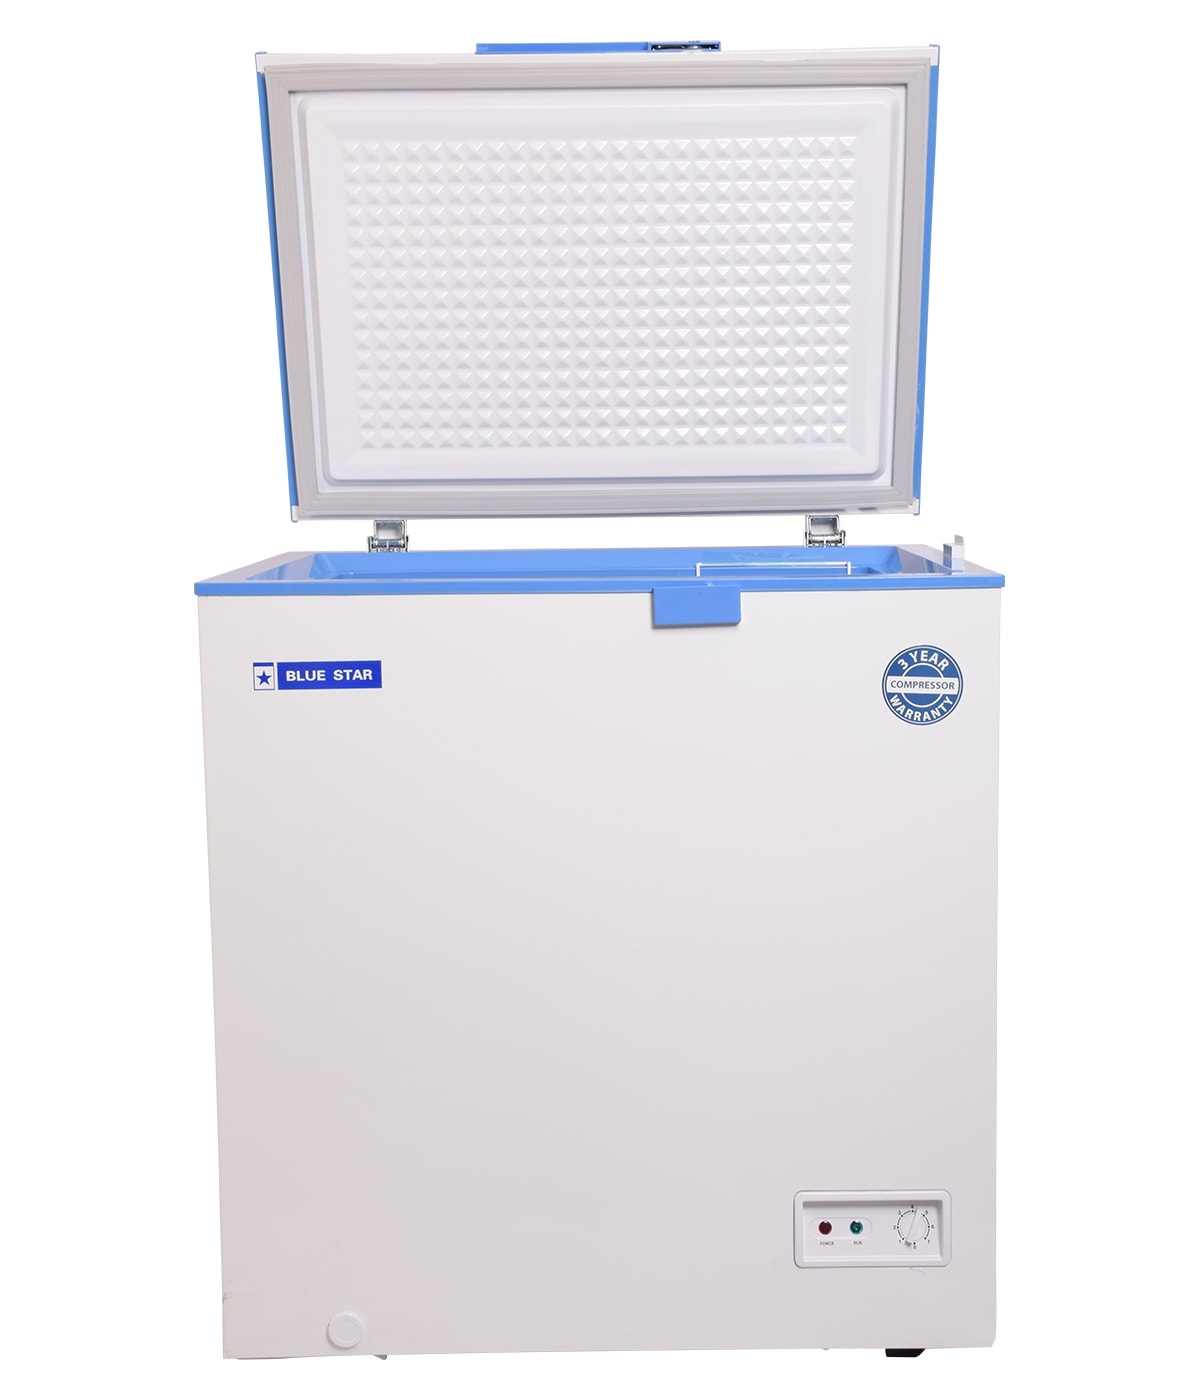 150 Liter Blue Star Deep Freezer Model Chf150